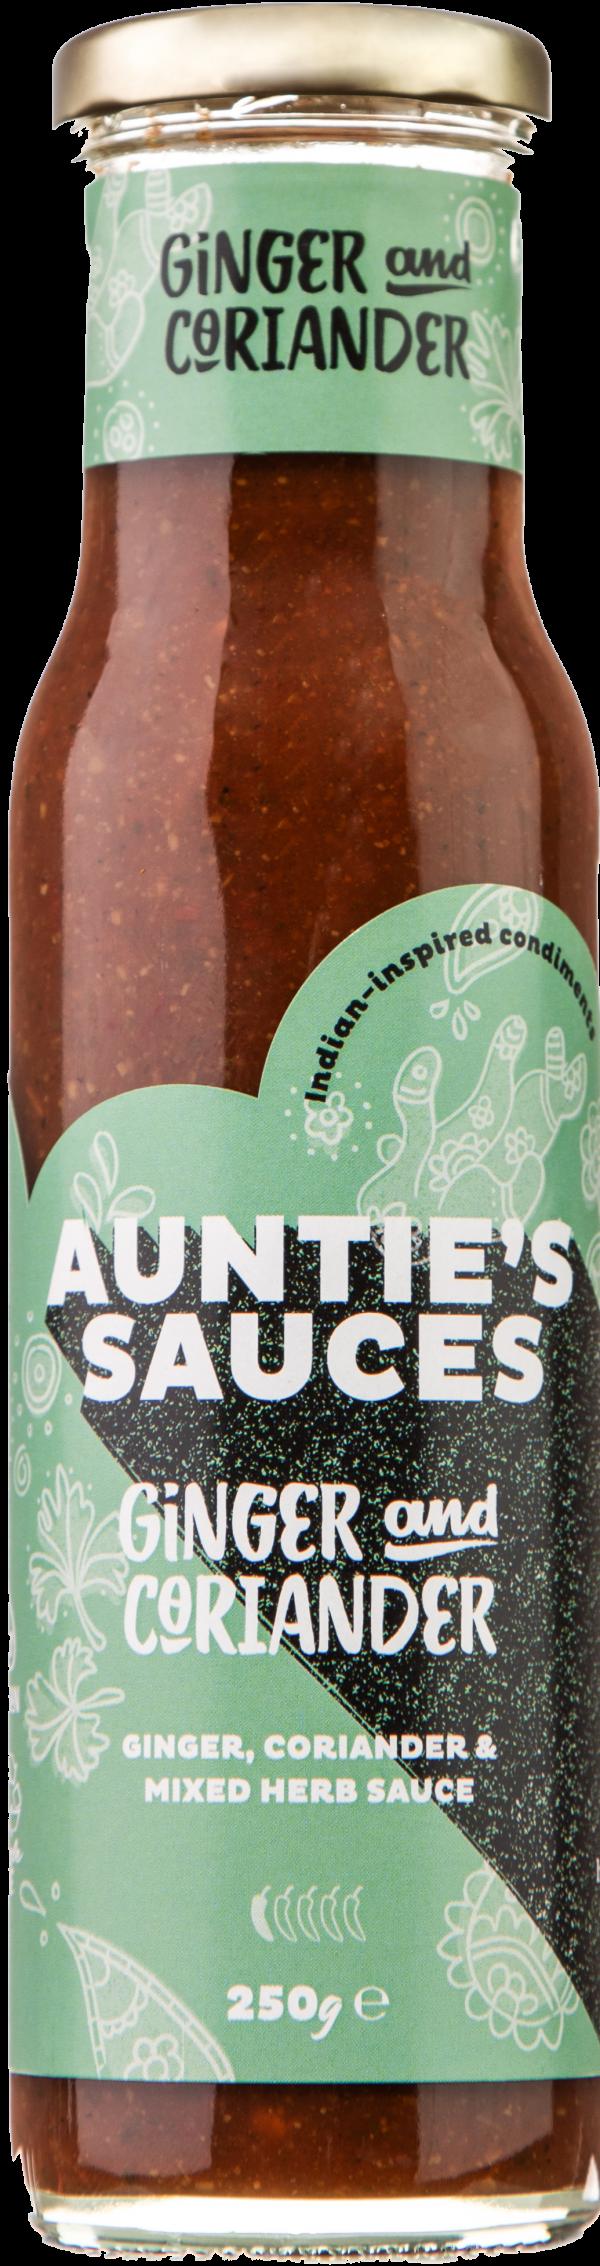 Auntie's Sauces Ginger & Coriander www.eatwithaunties.com